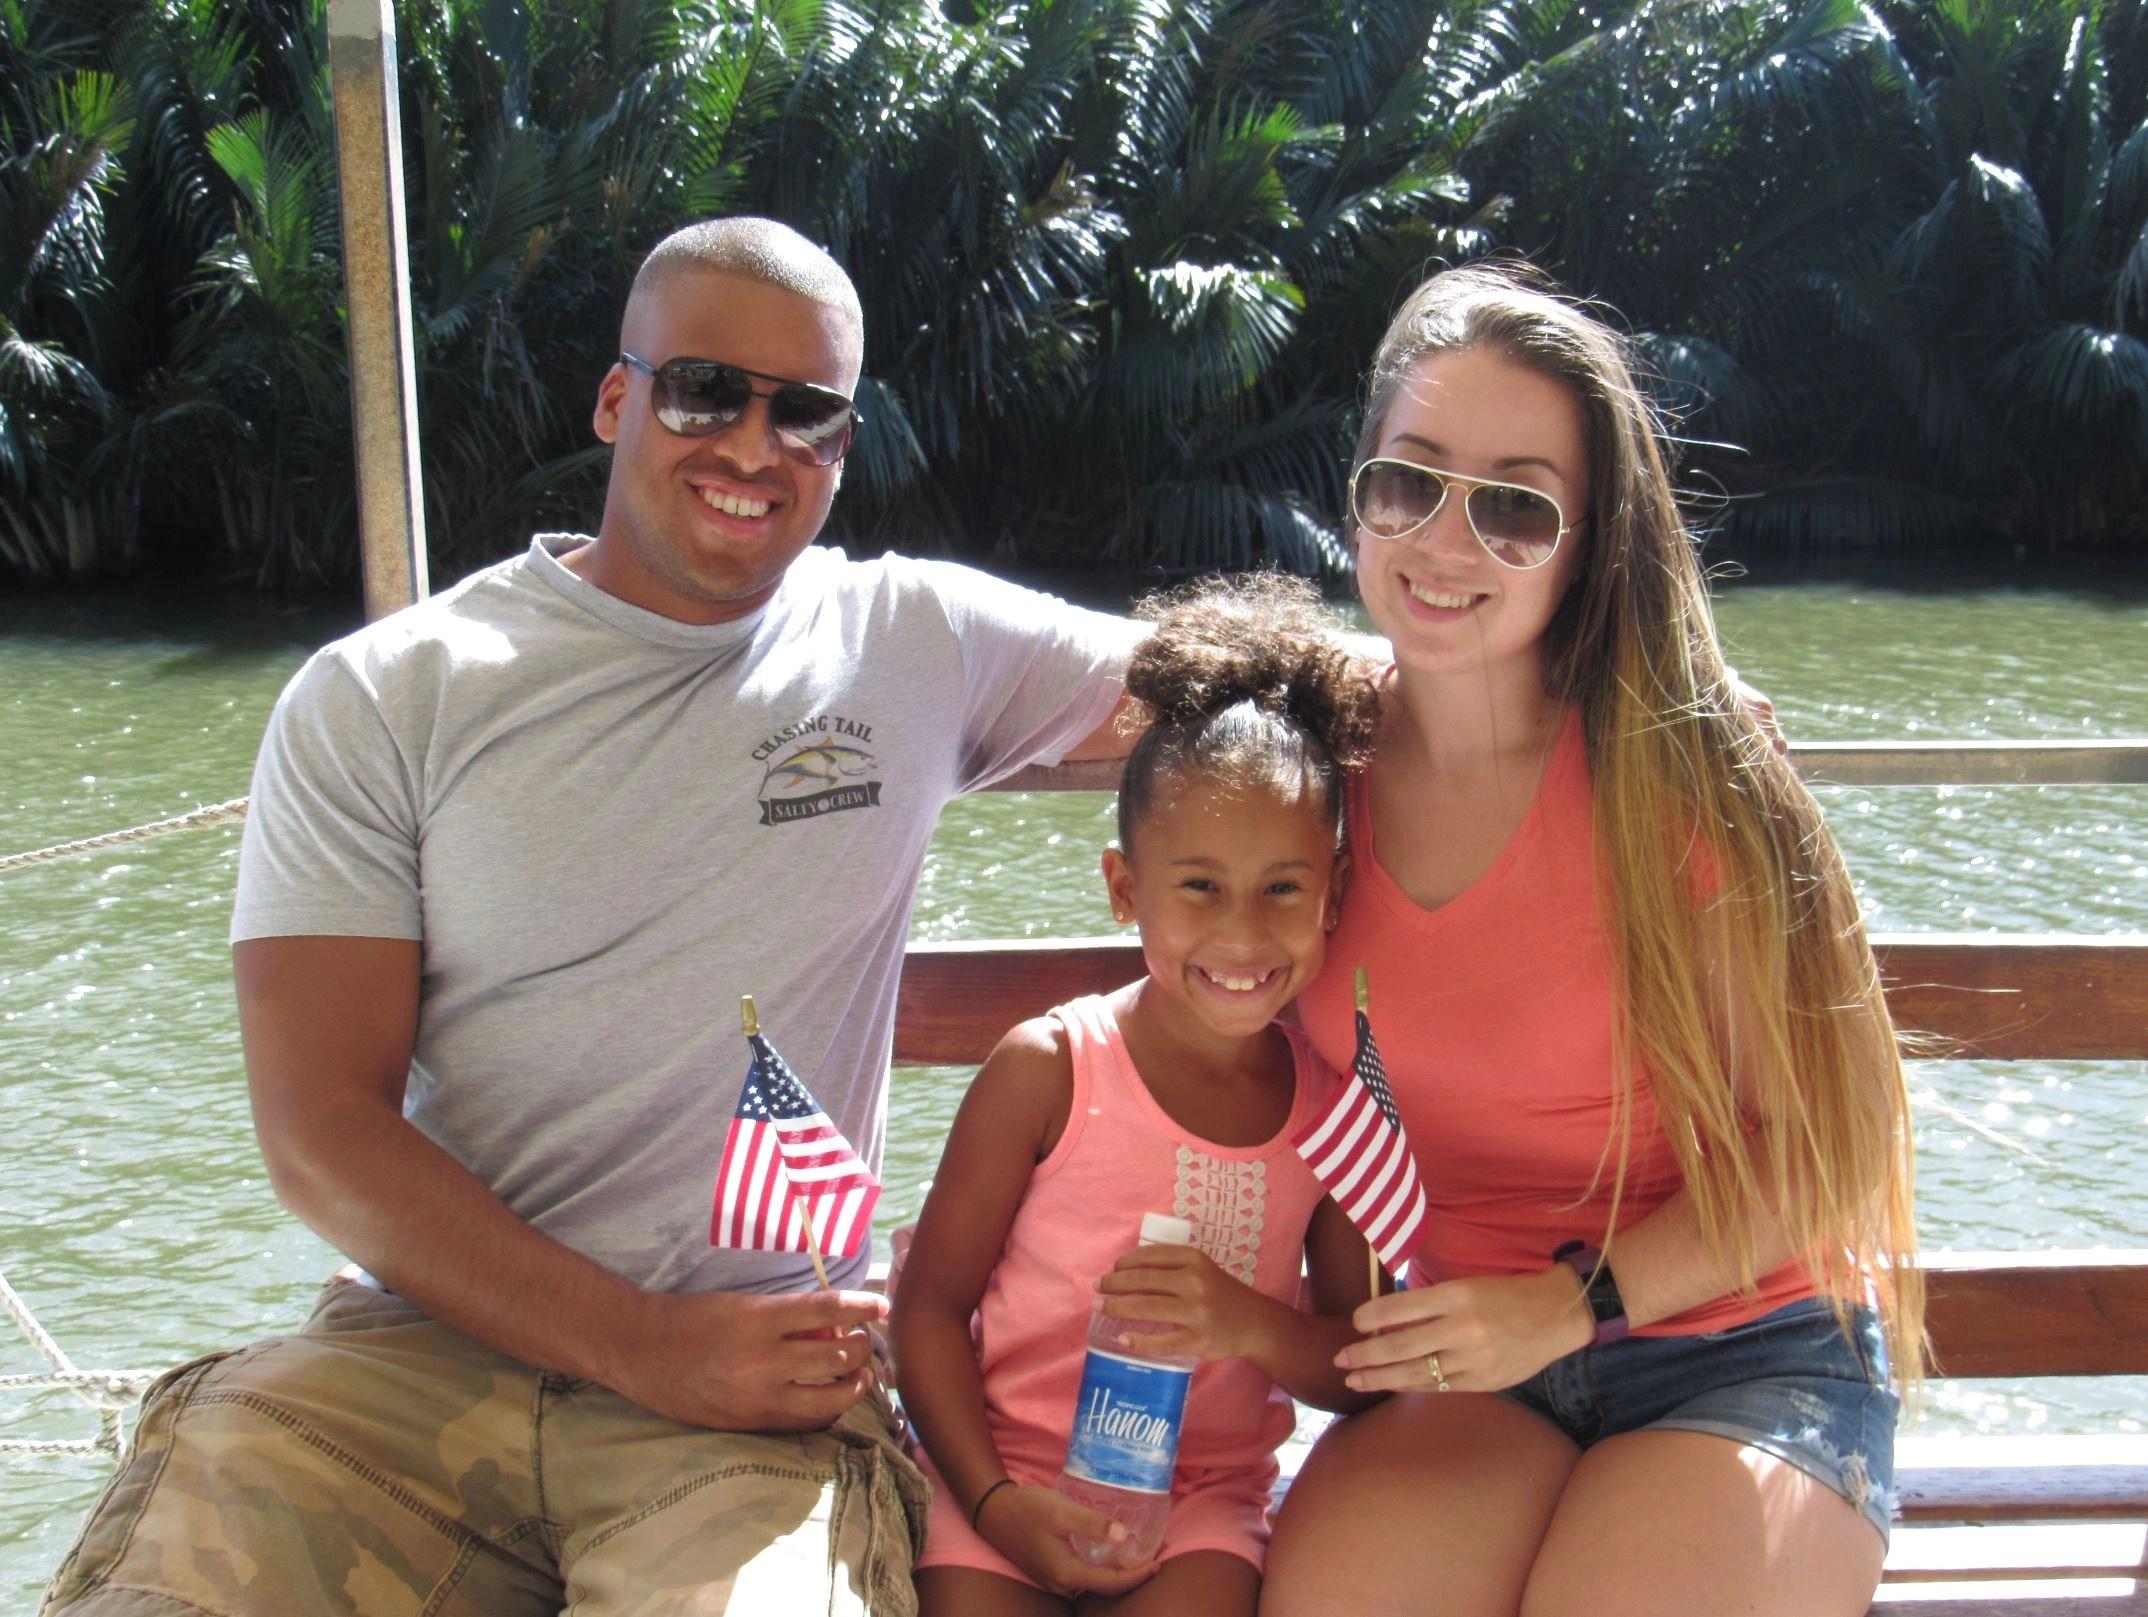 Veteran and Military appreciation at Guam's #1 Outdoor Cultural Adventure Experience